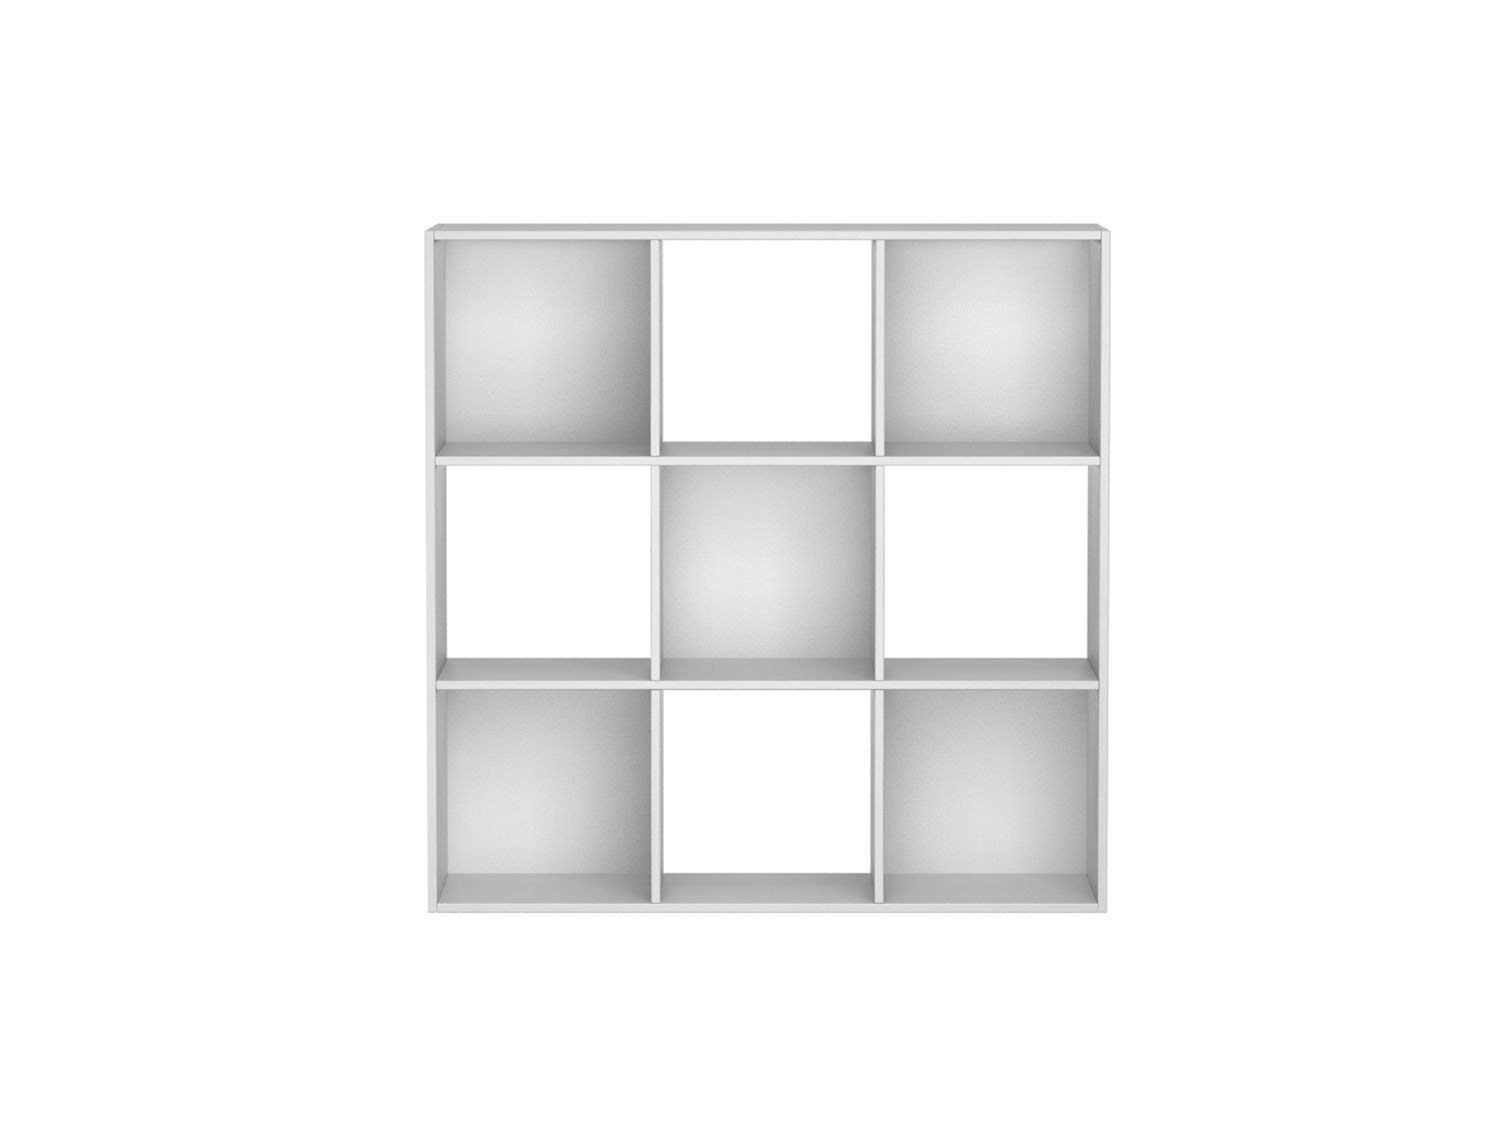 Cheap 9 Cube Organizer White, find 9 Cube Organizer White